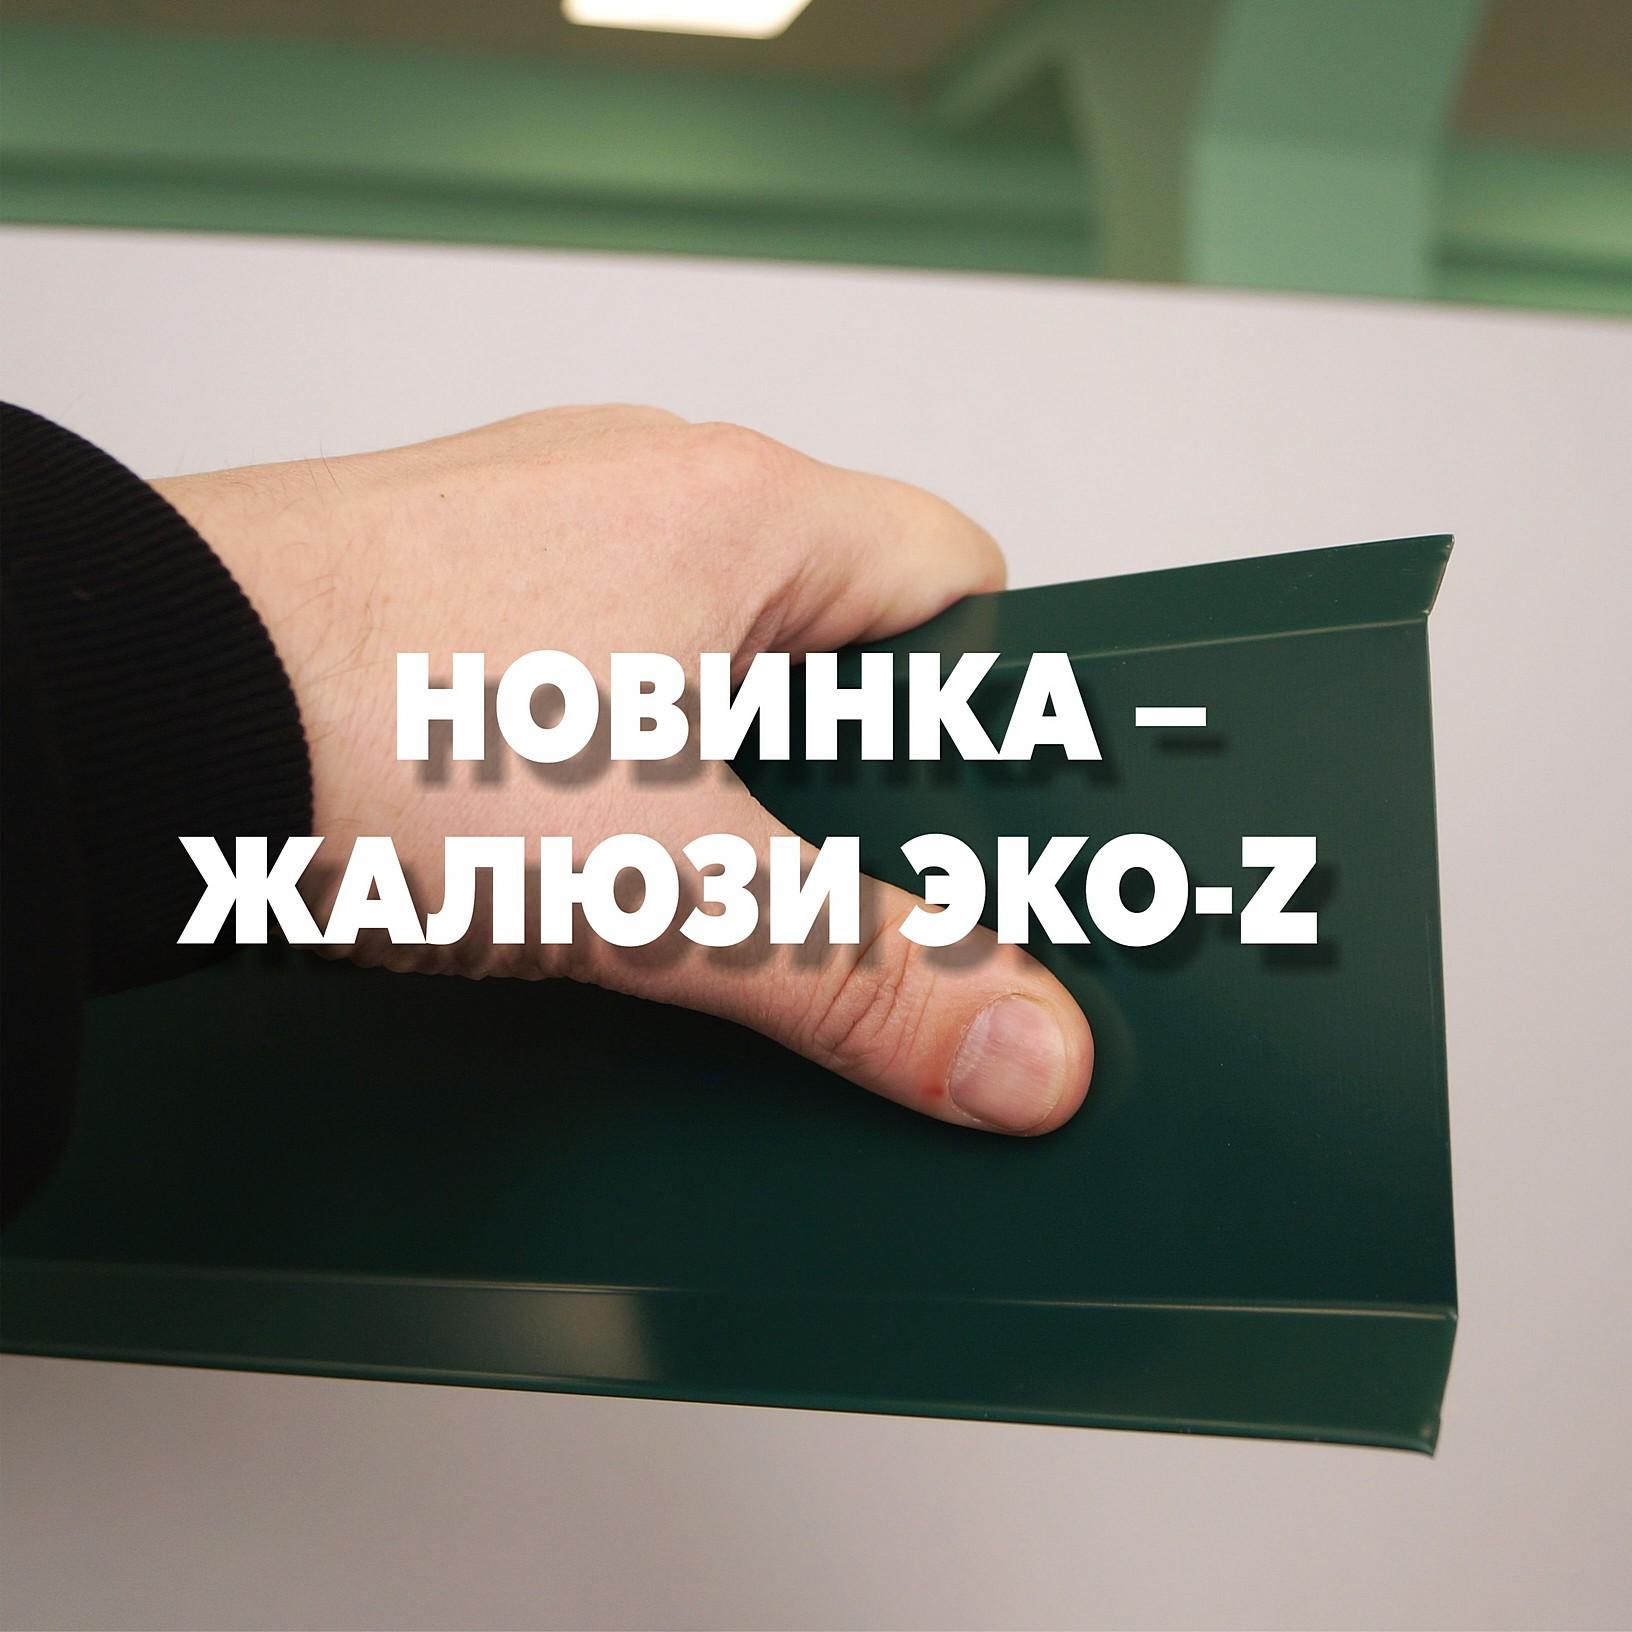 Заборы-жалюзи ЭКО-Z новинка-0